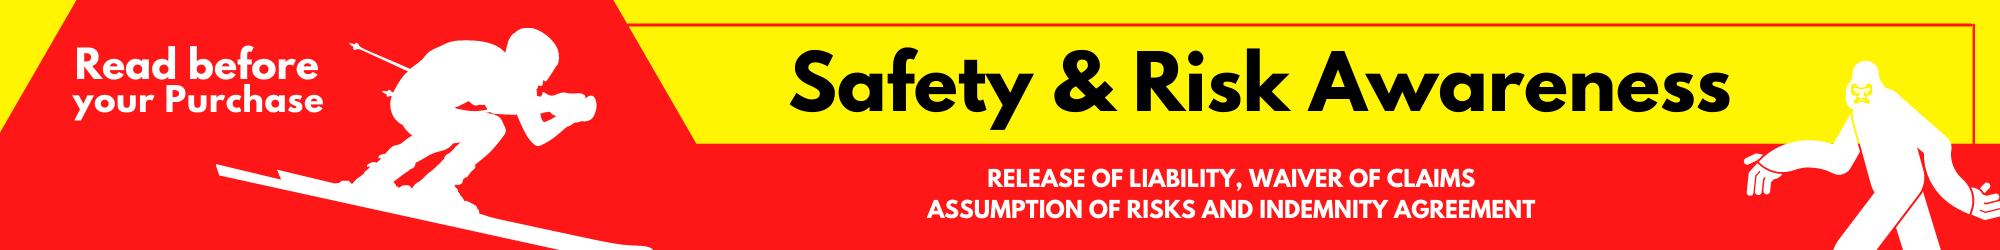 Safety & Risk Awareness Banner